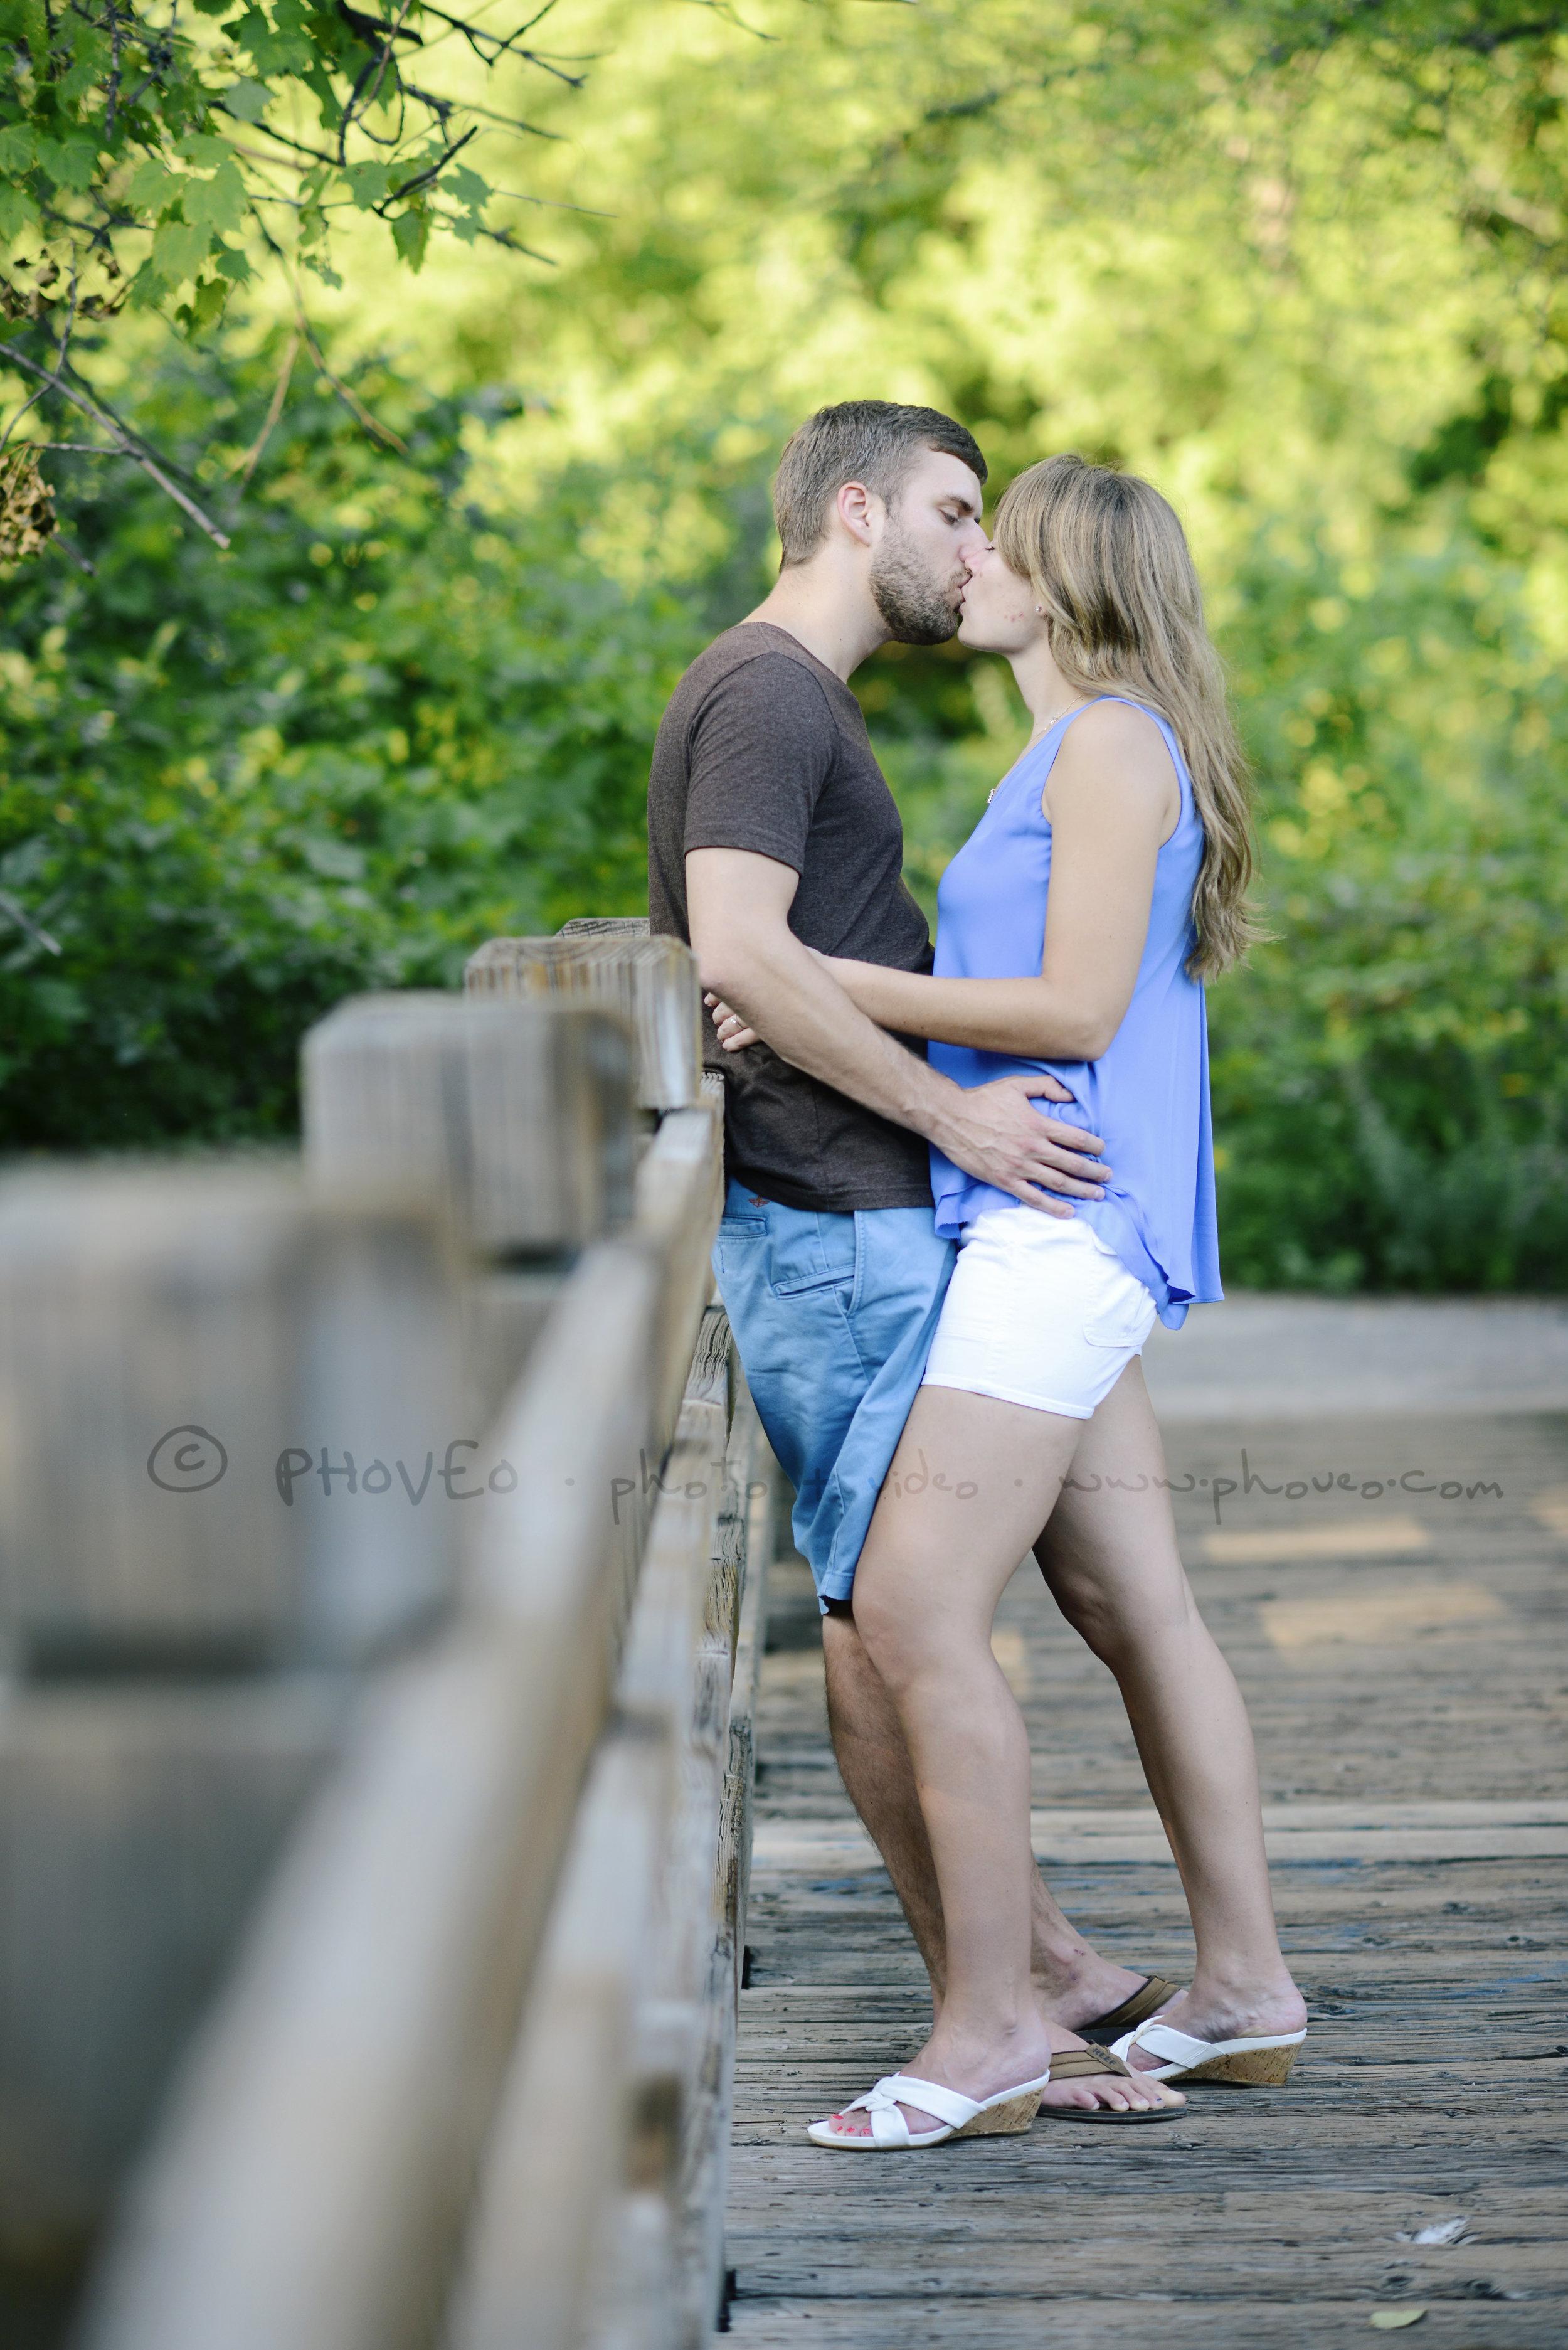 WM_20160828_Christine+Luke_18.jpg